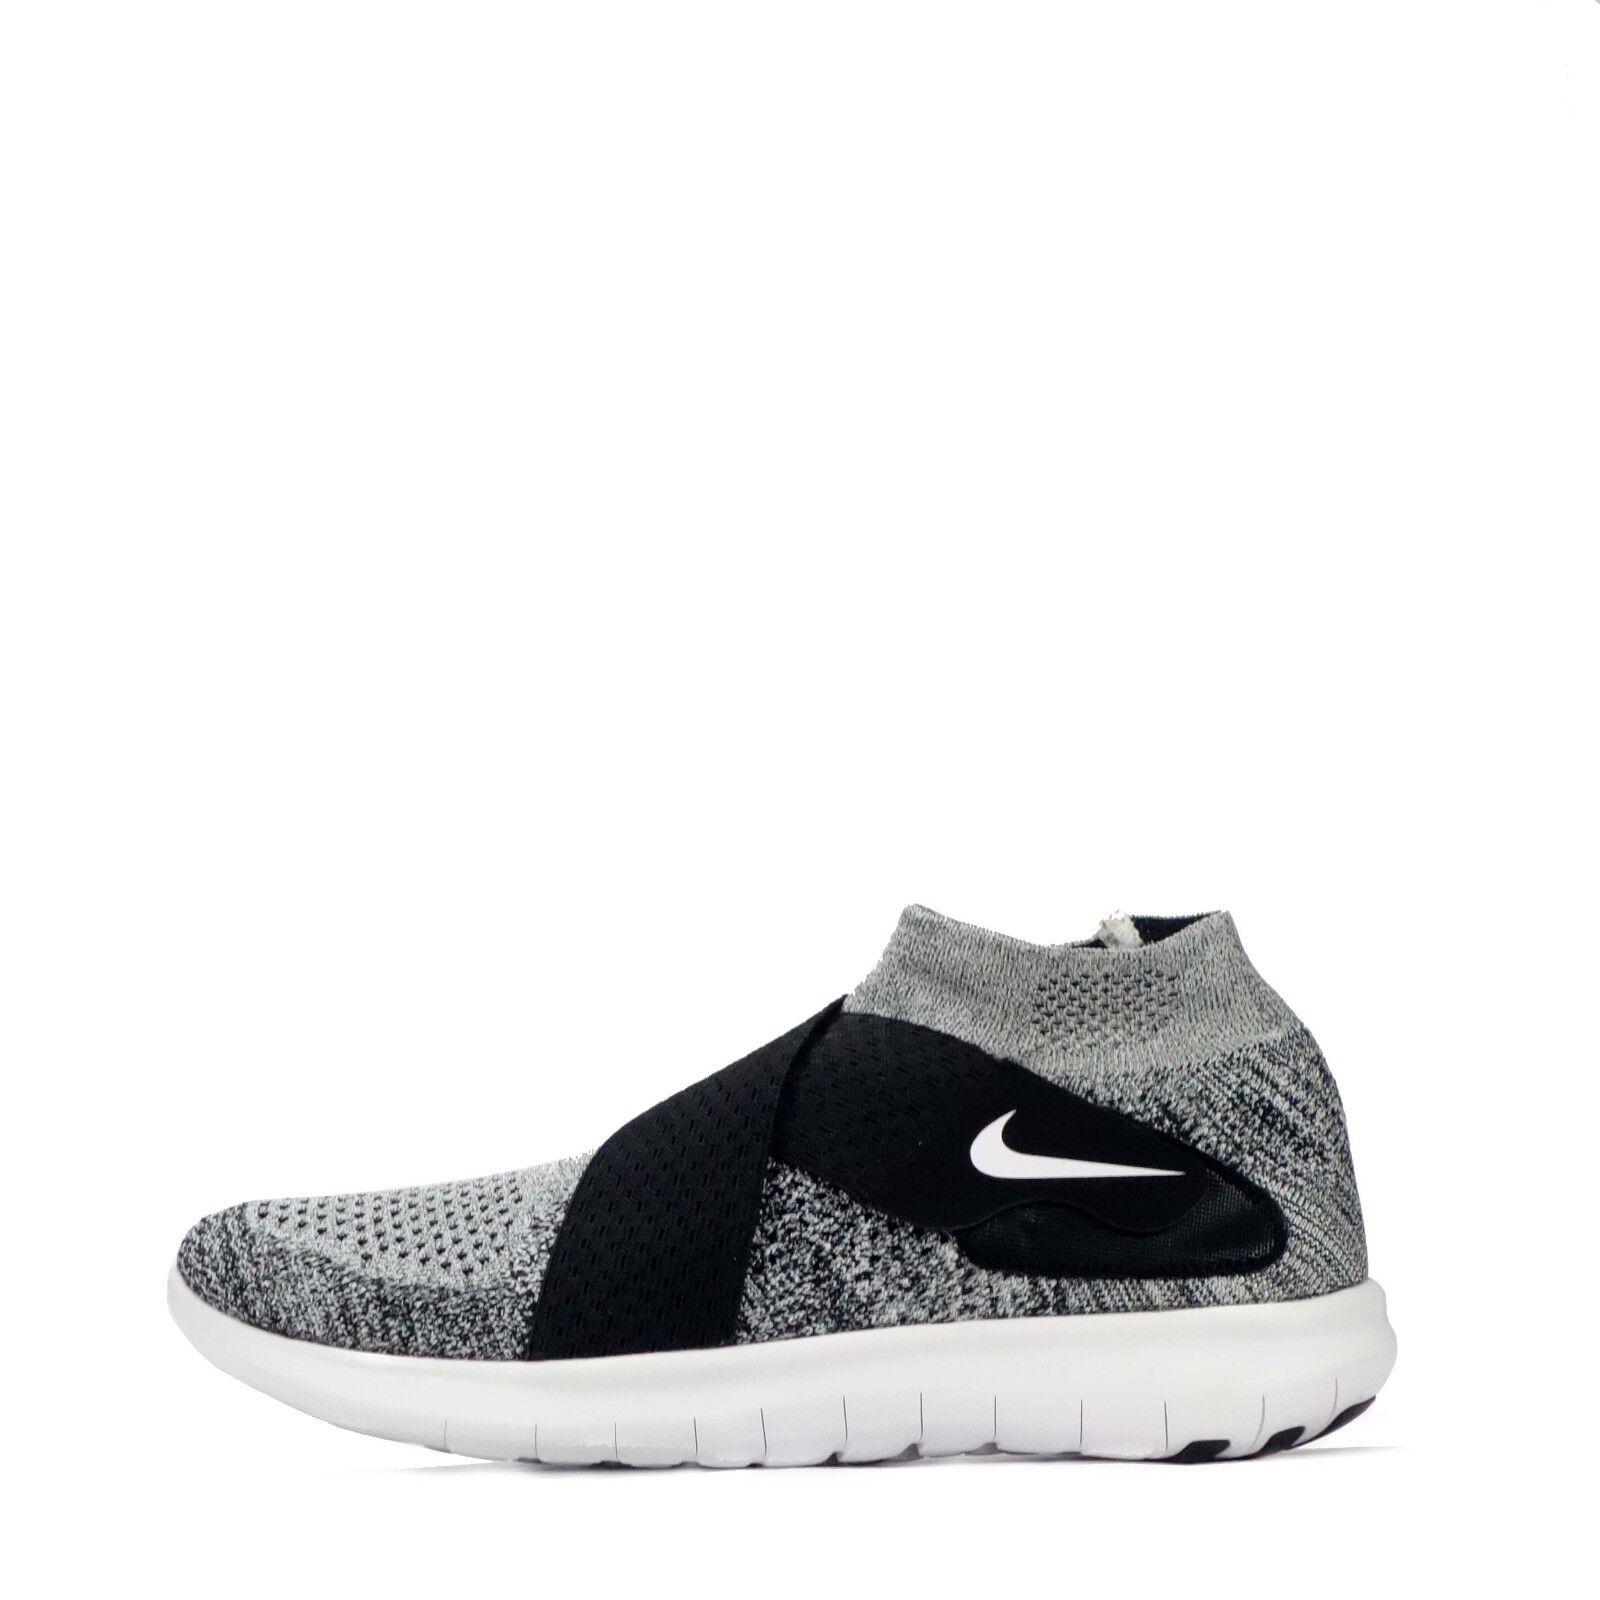 Nike Free RN Motion Flyknit 2017 Men's Running shoes Black White